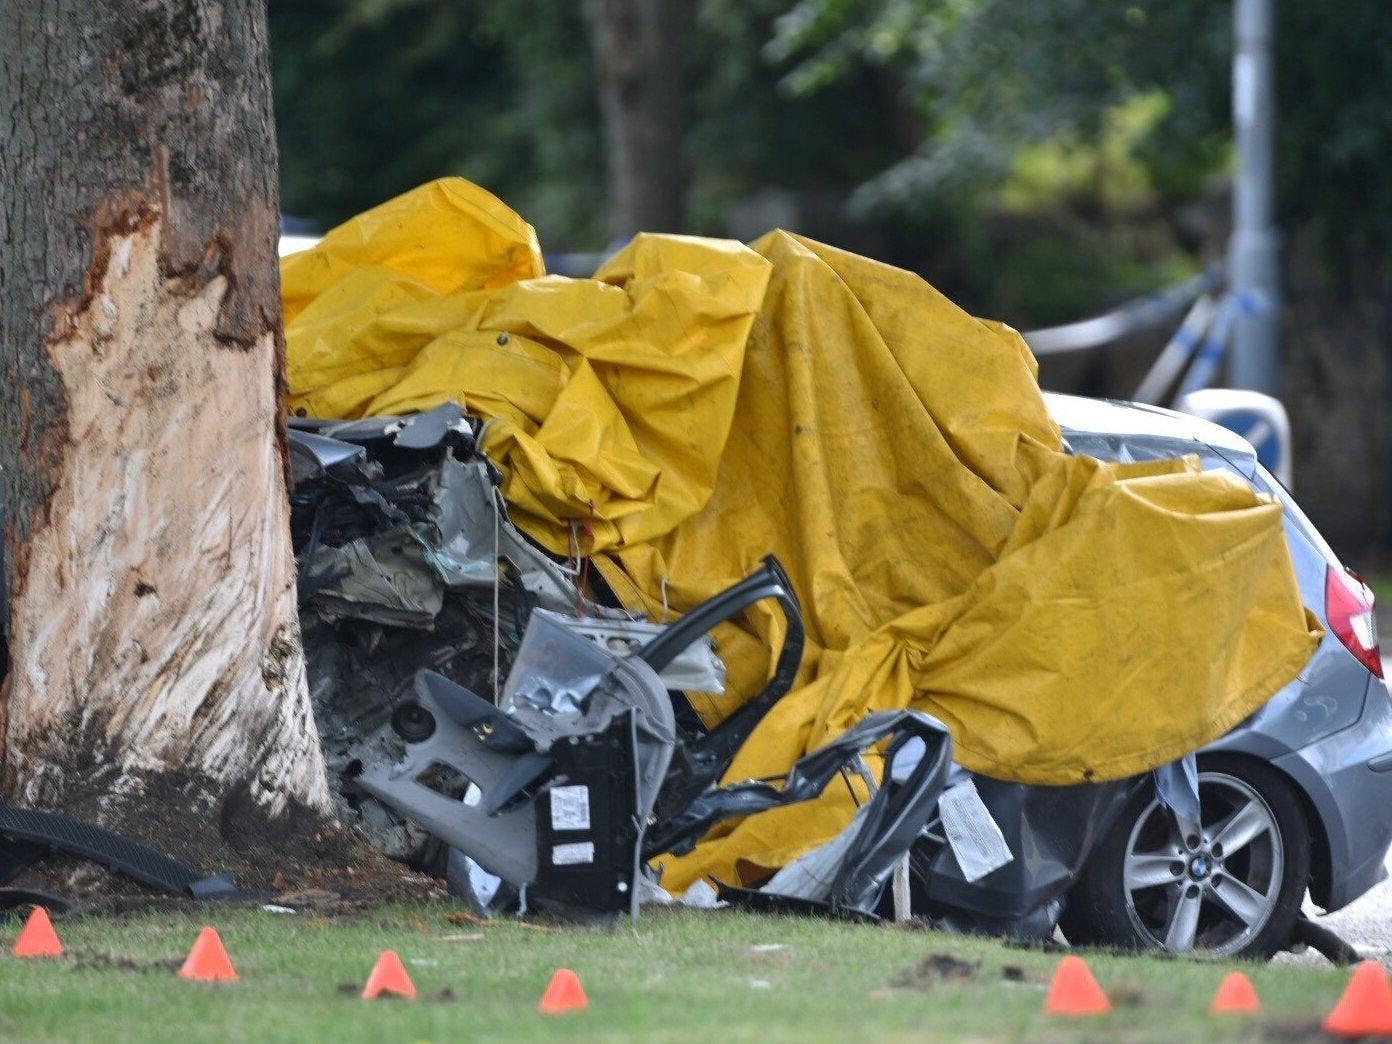 Bradford car crash: Four men being followed by unmarked